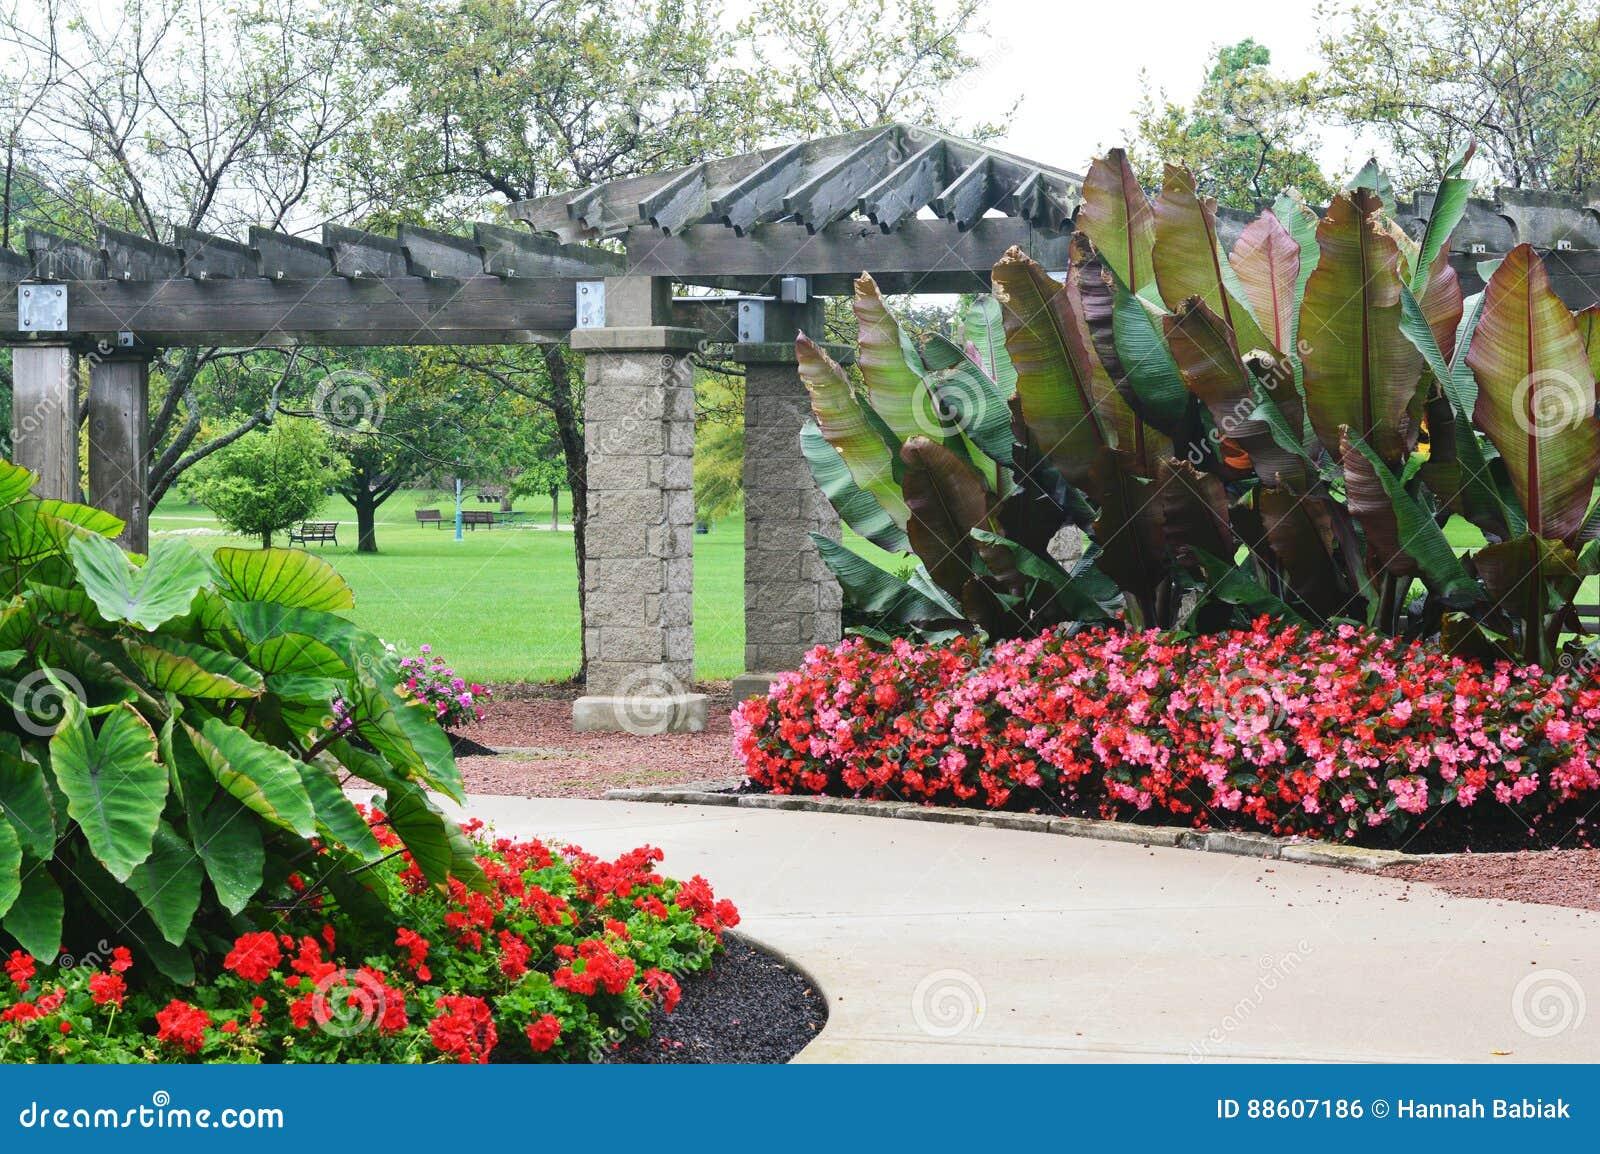 Flower Garden Eichelman Park Kenosha Wisconsin Stock Photo